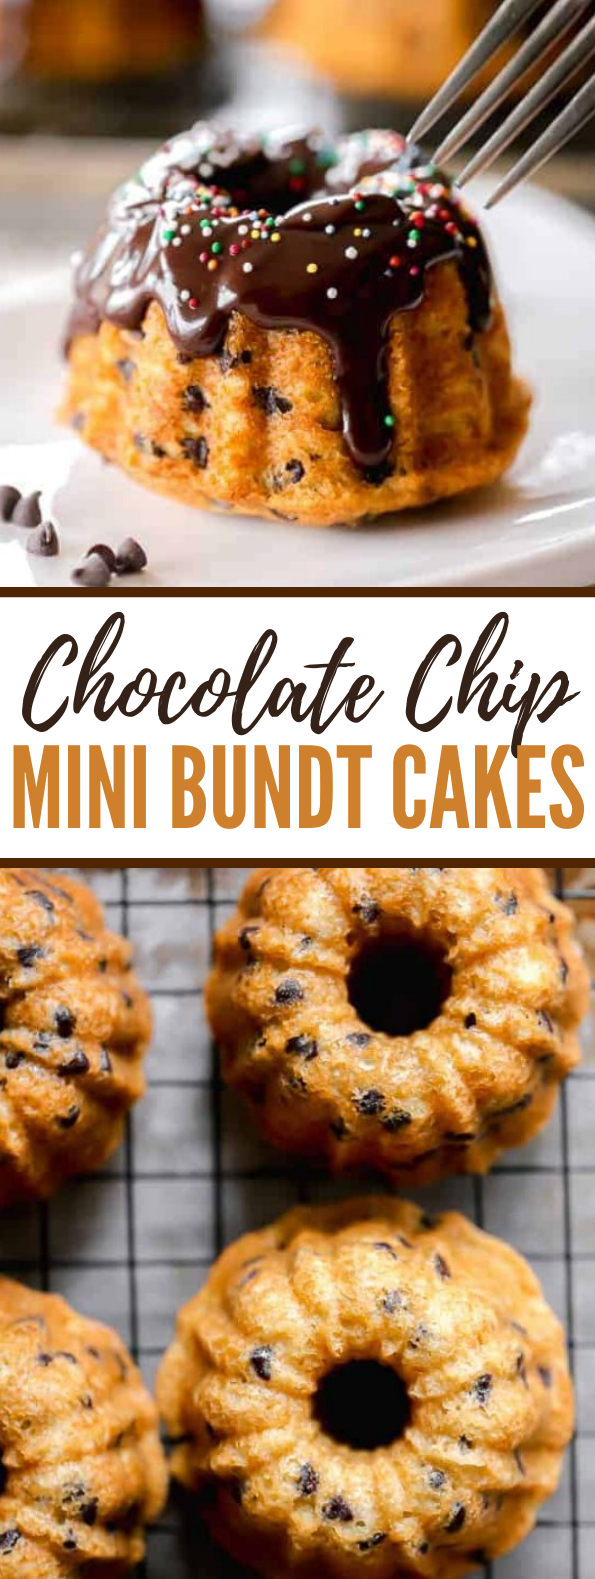 Chocolate Chip Mini Bundt Cakes #desserts #sweets